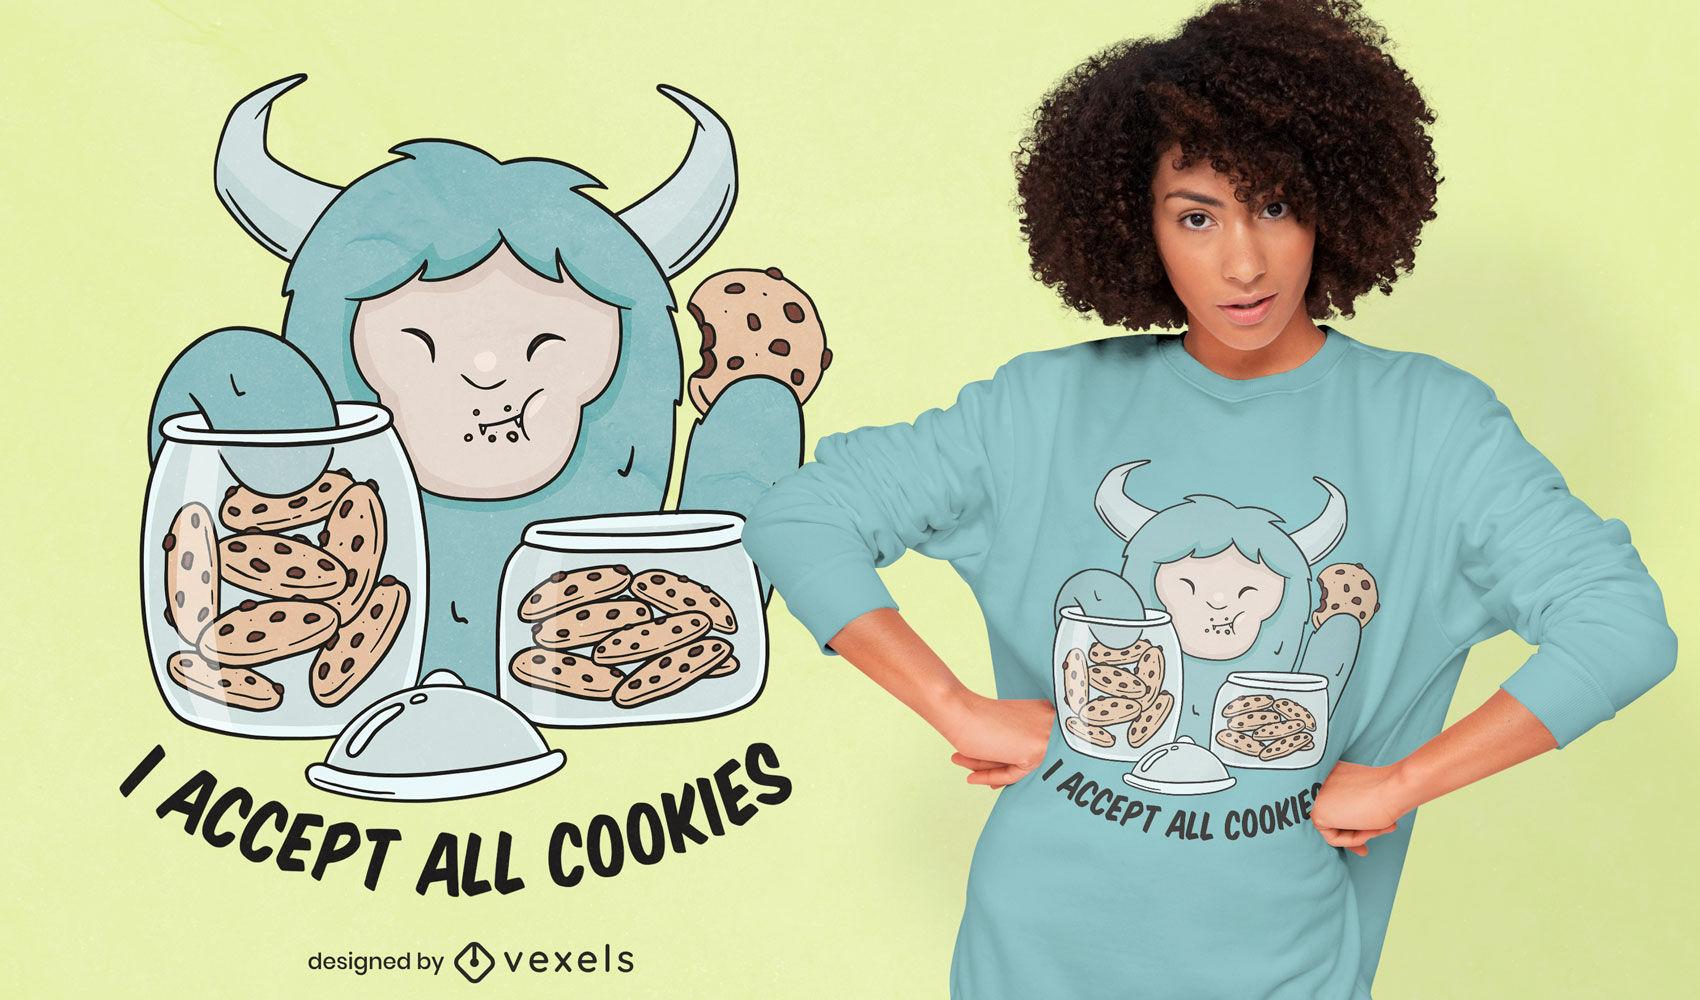 Yeti monster eating cookies t-shirt design